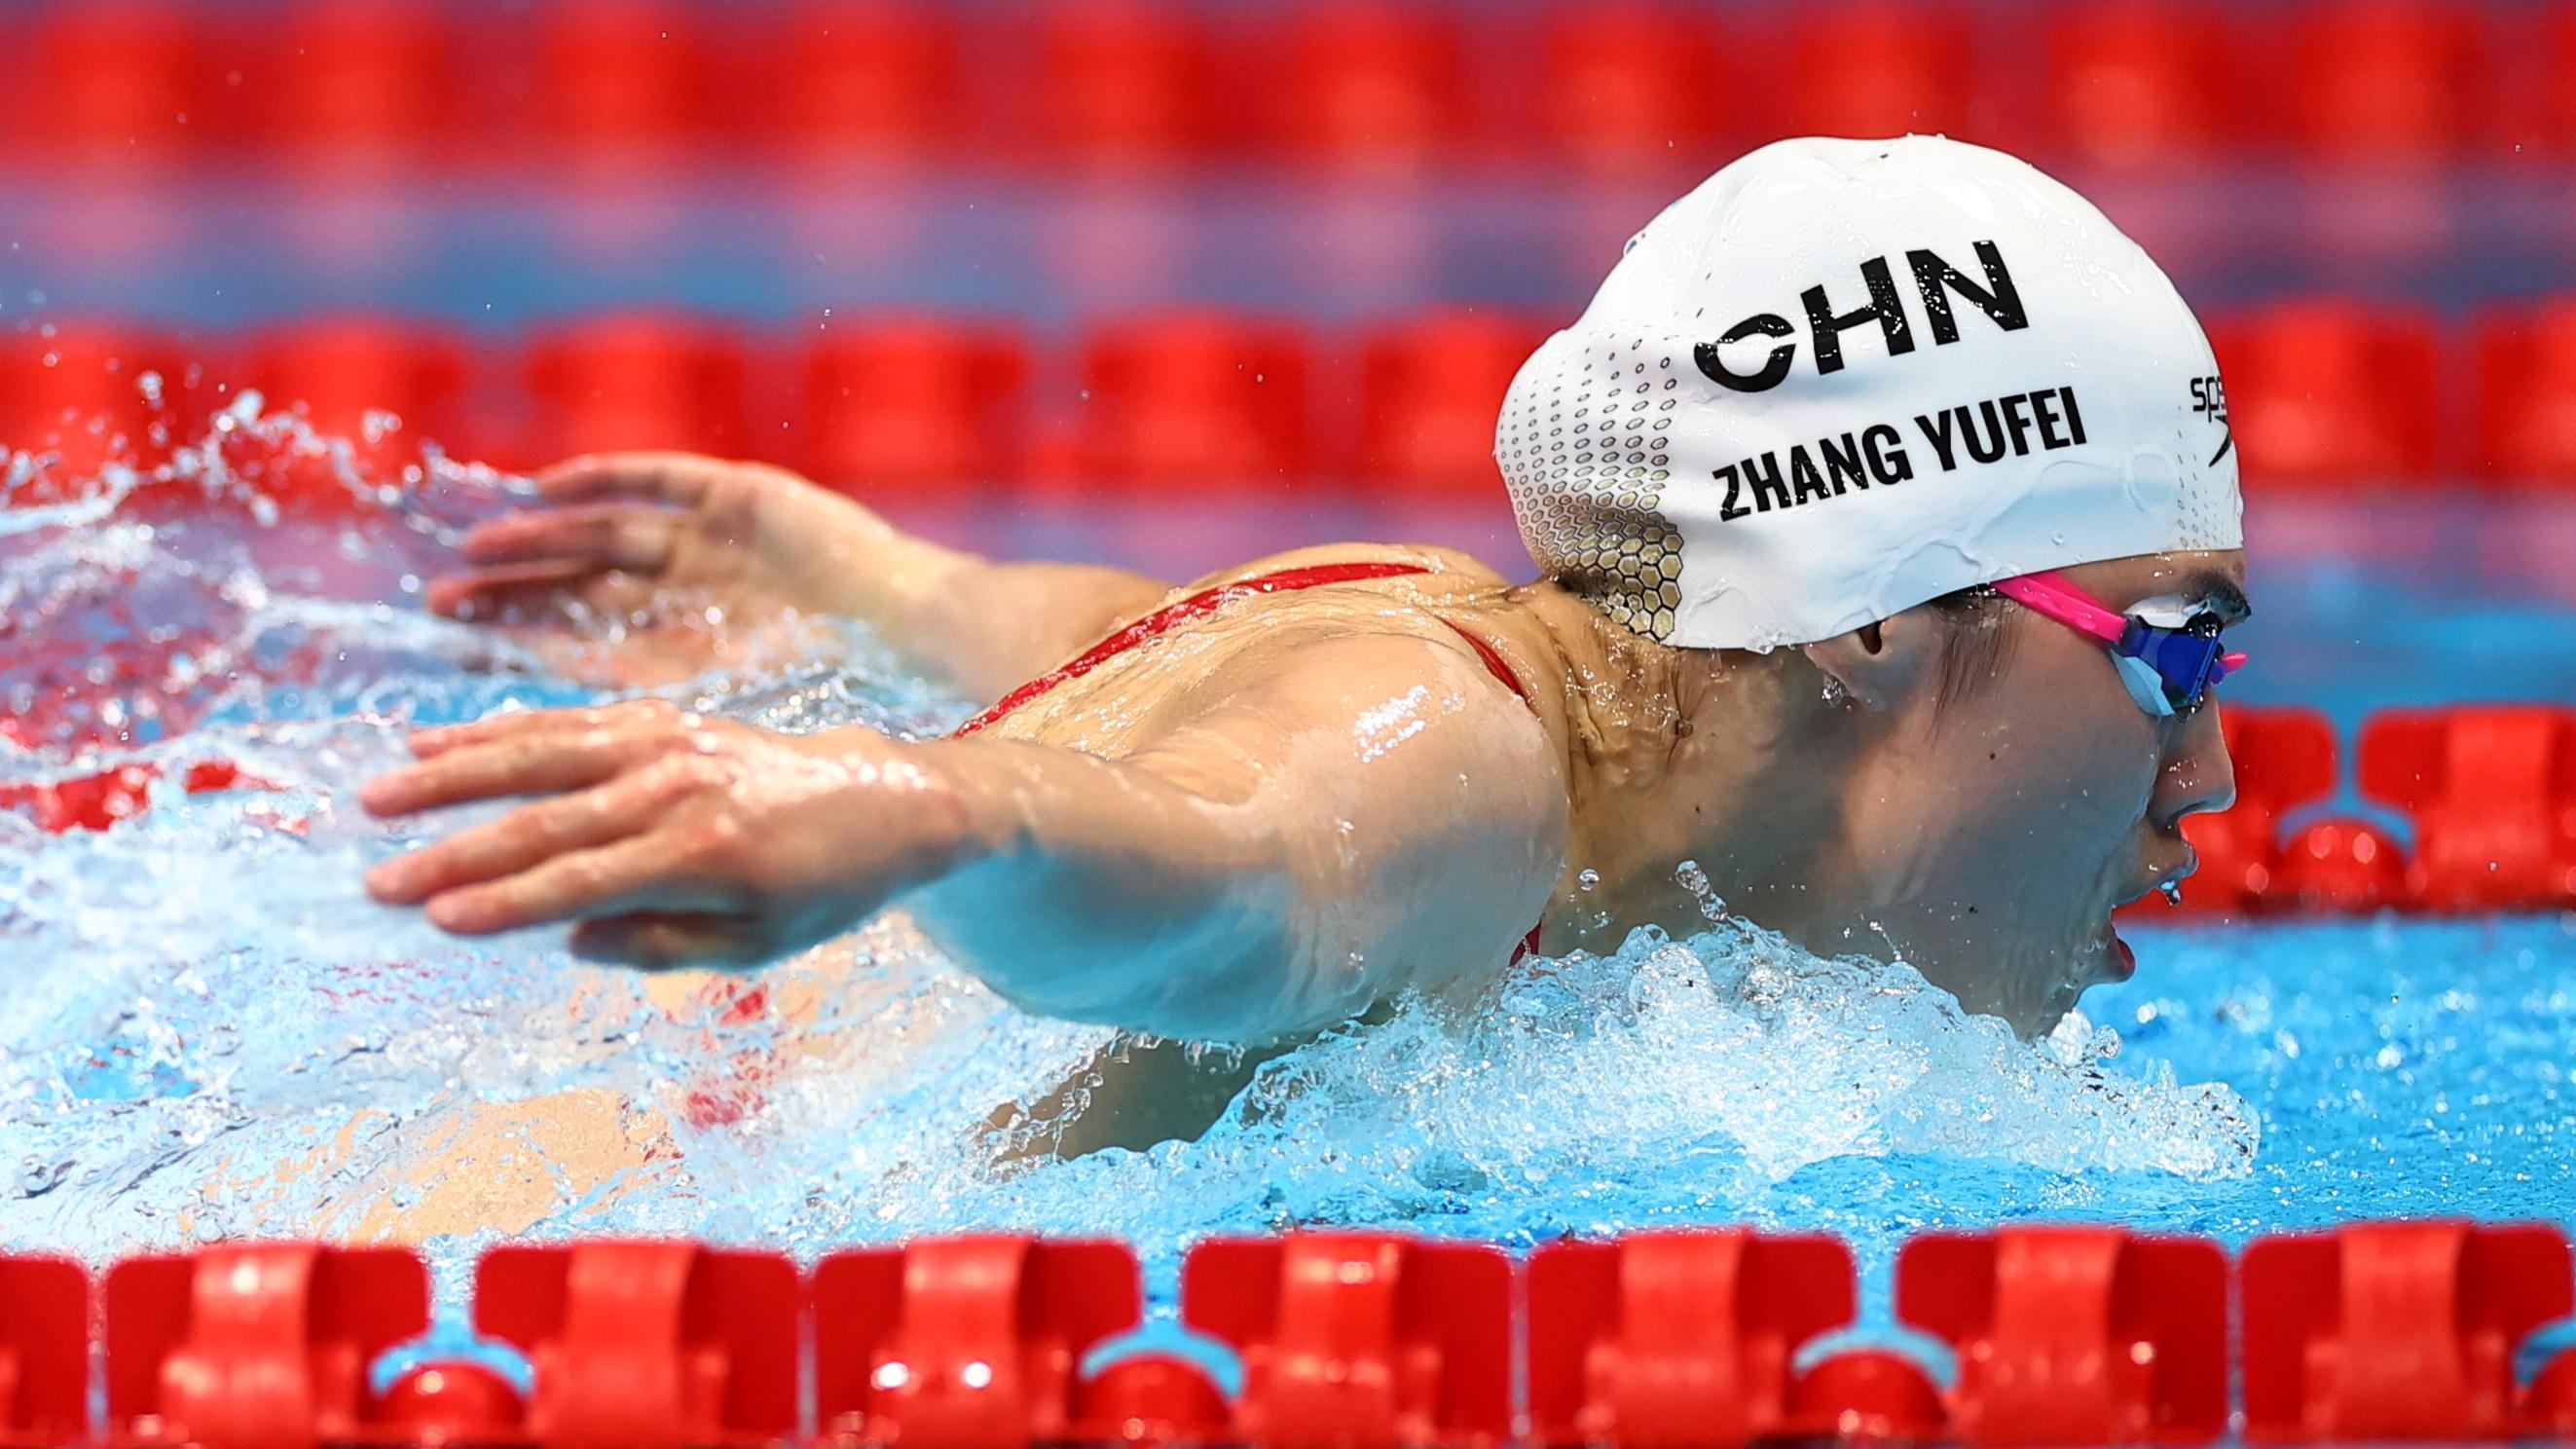 Tokyo 2020 Olympics - Swimming - Women's 200m Butterfly - Final - Tokyo Aquatics Centre - Tokyo, Japan - July 29, 2021. Zhang Yufei of China in action REUTERS/Kai Pfaffenbach